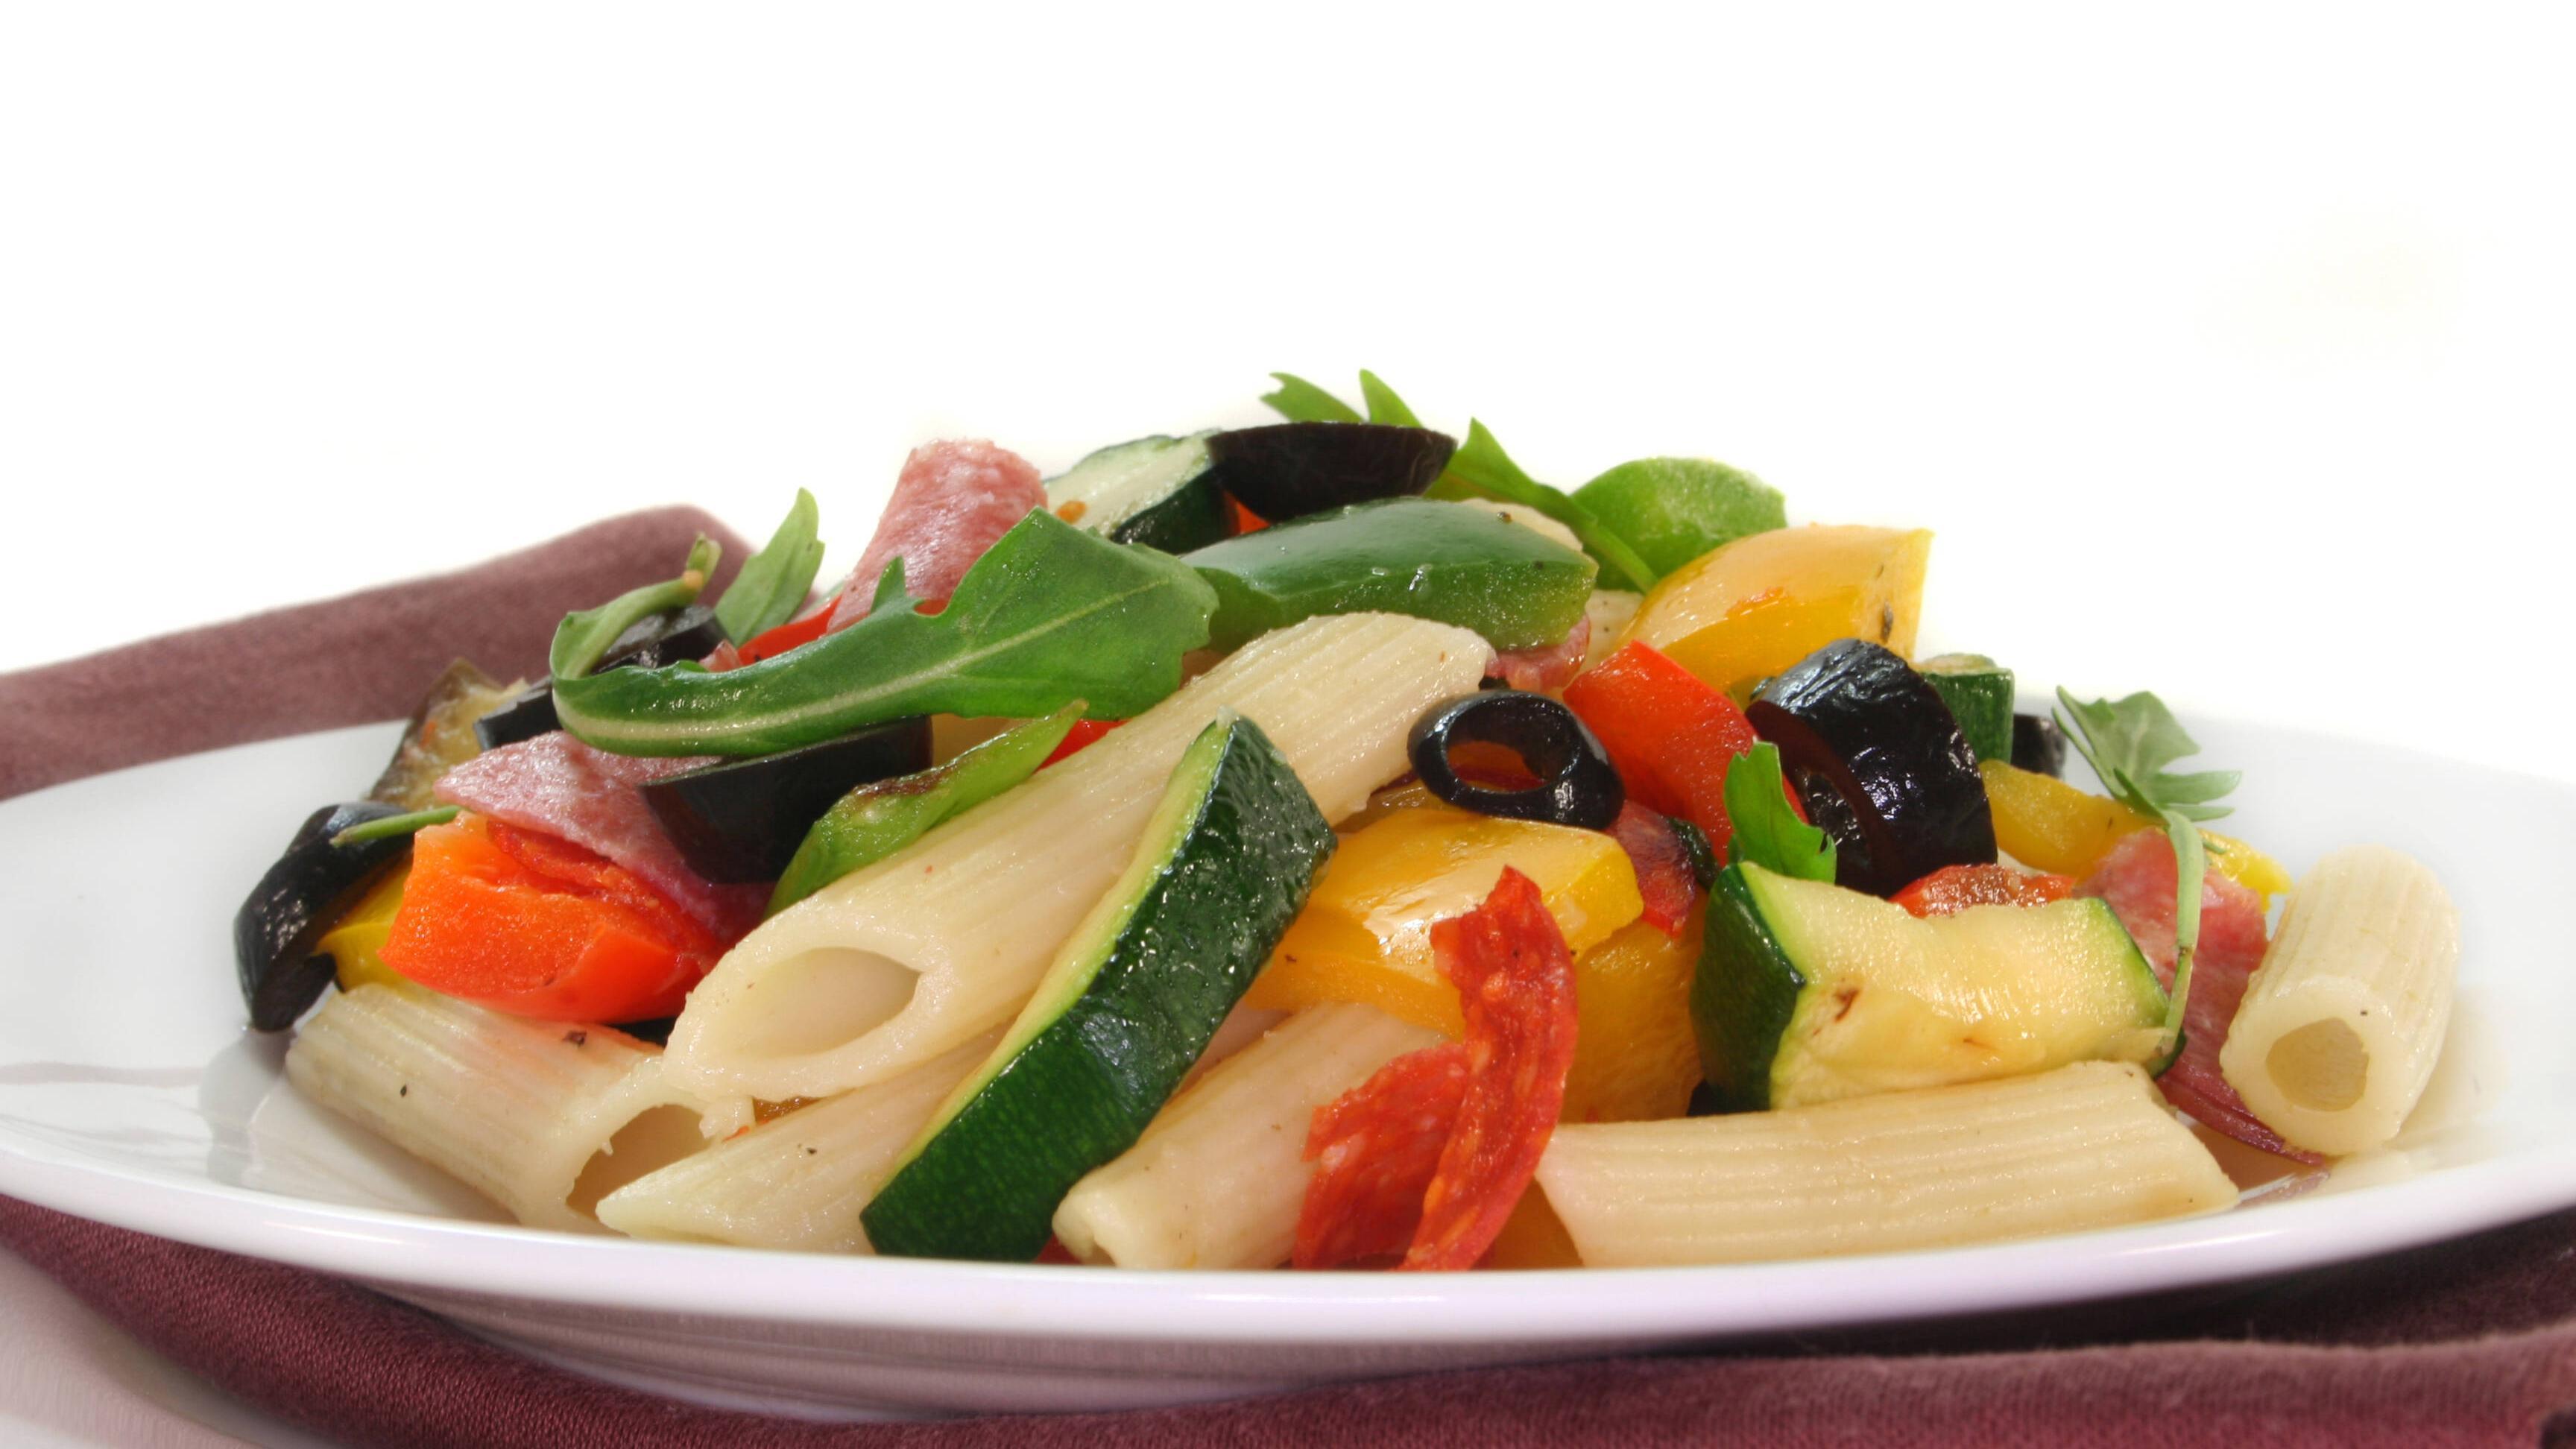 Nudelsalat ohne Mayonnaise: Einfaches Rezept